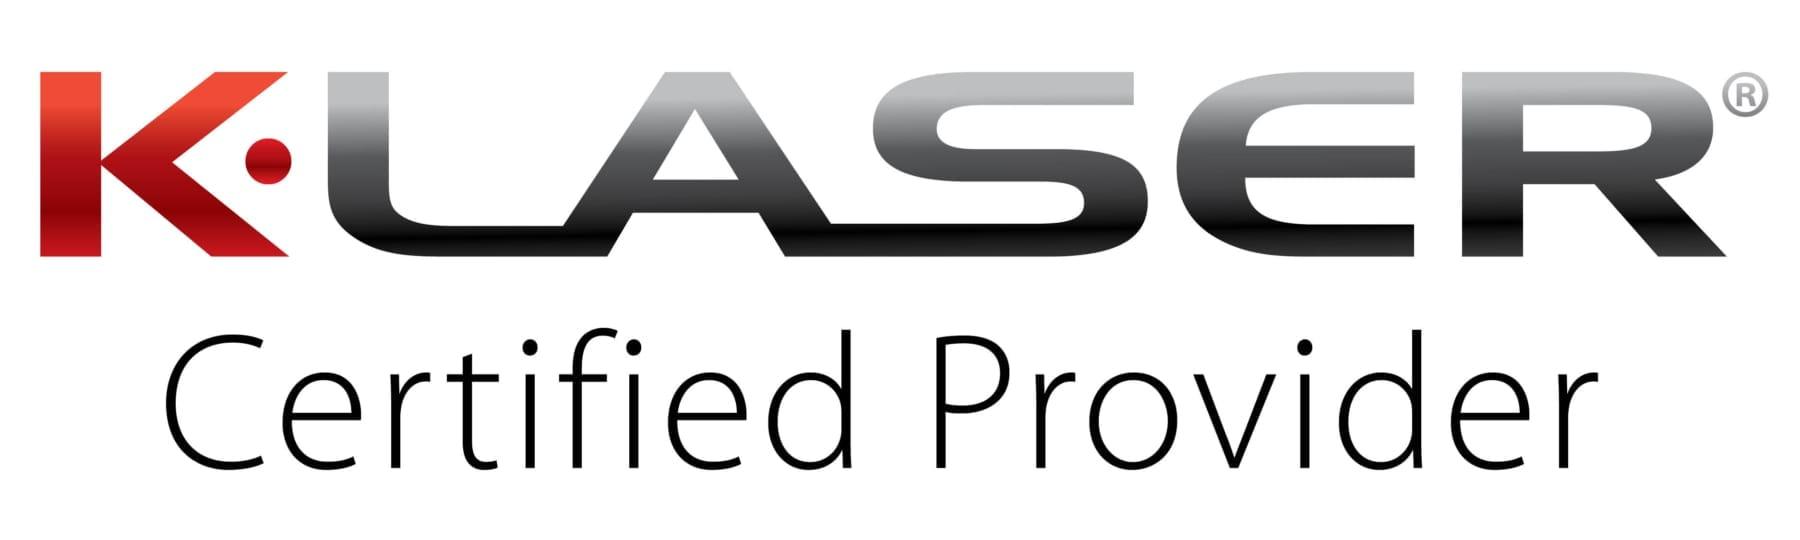 K-Laser Certified Provider Indiana